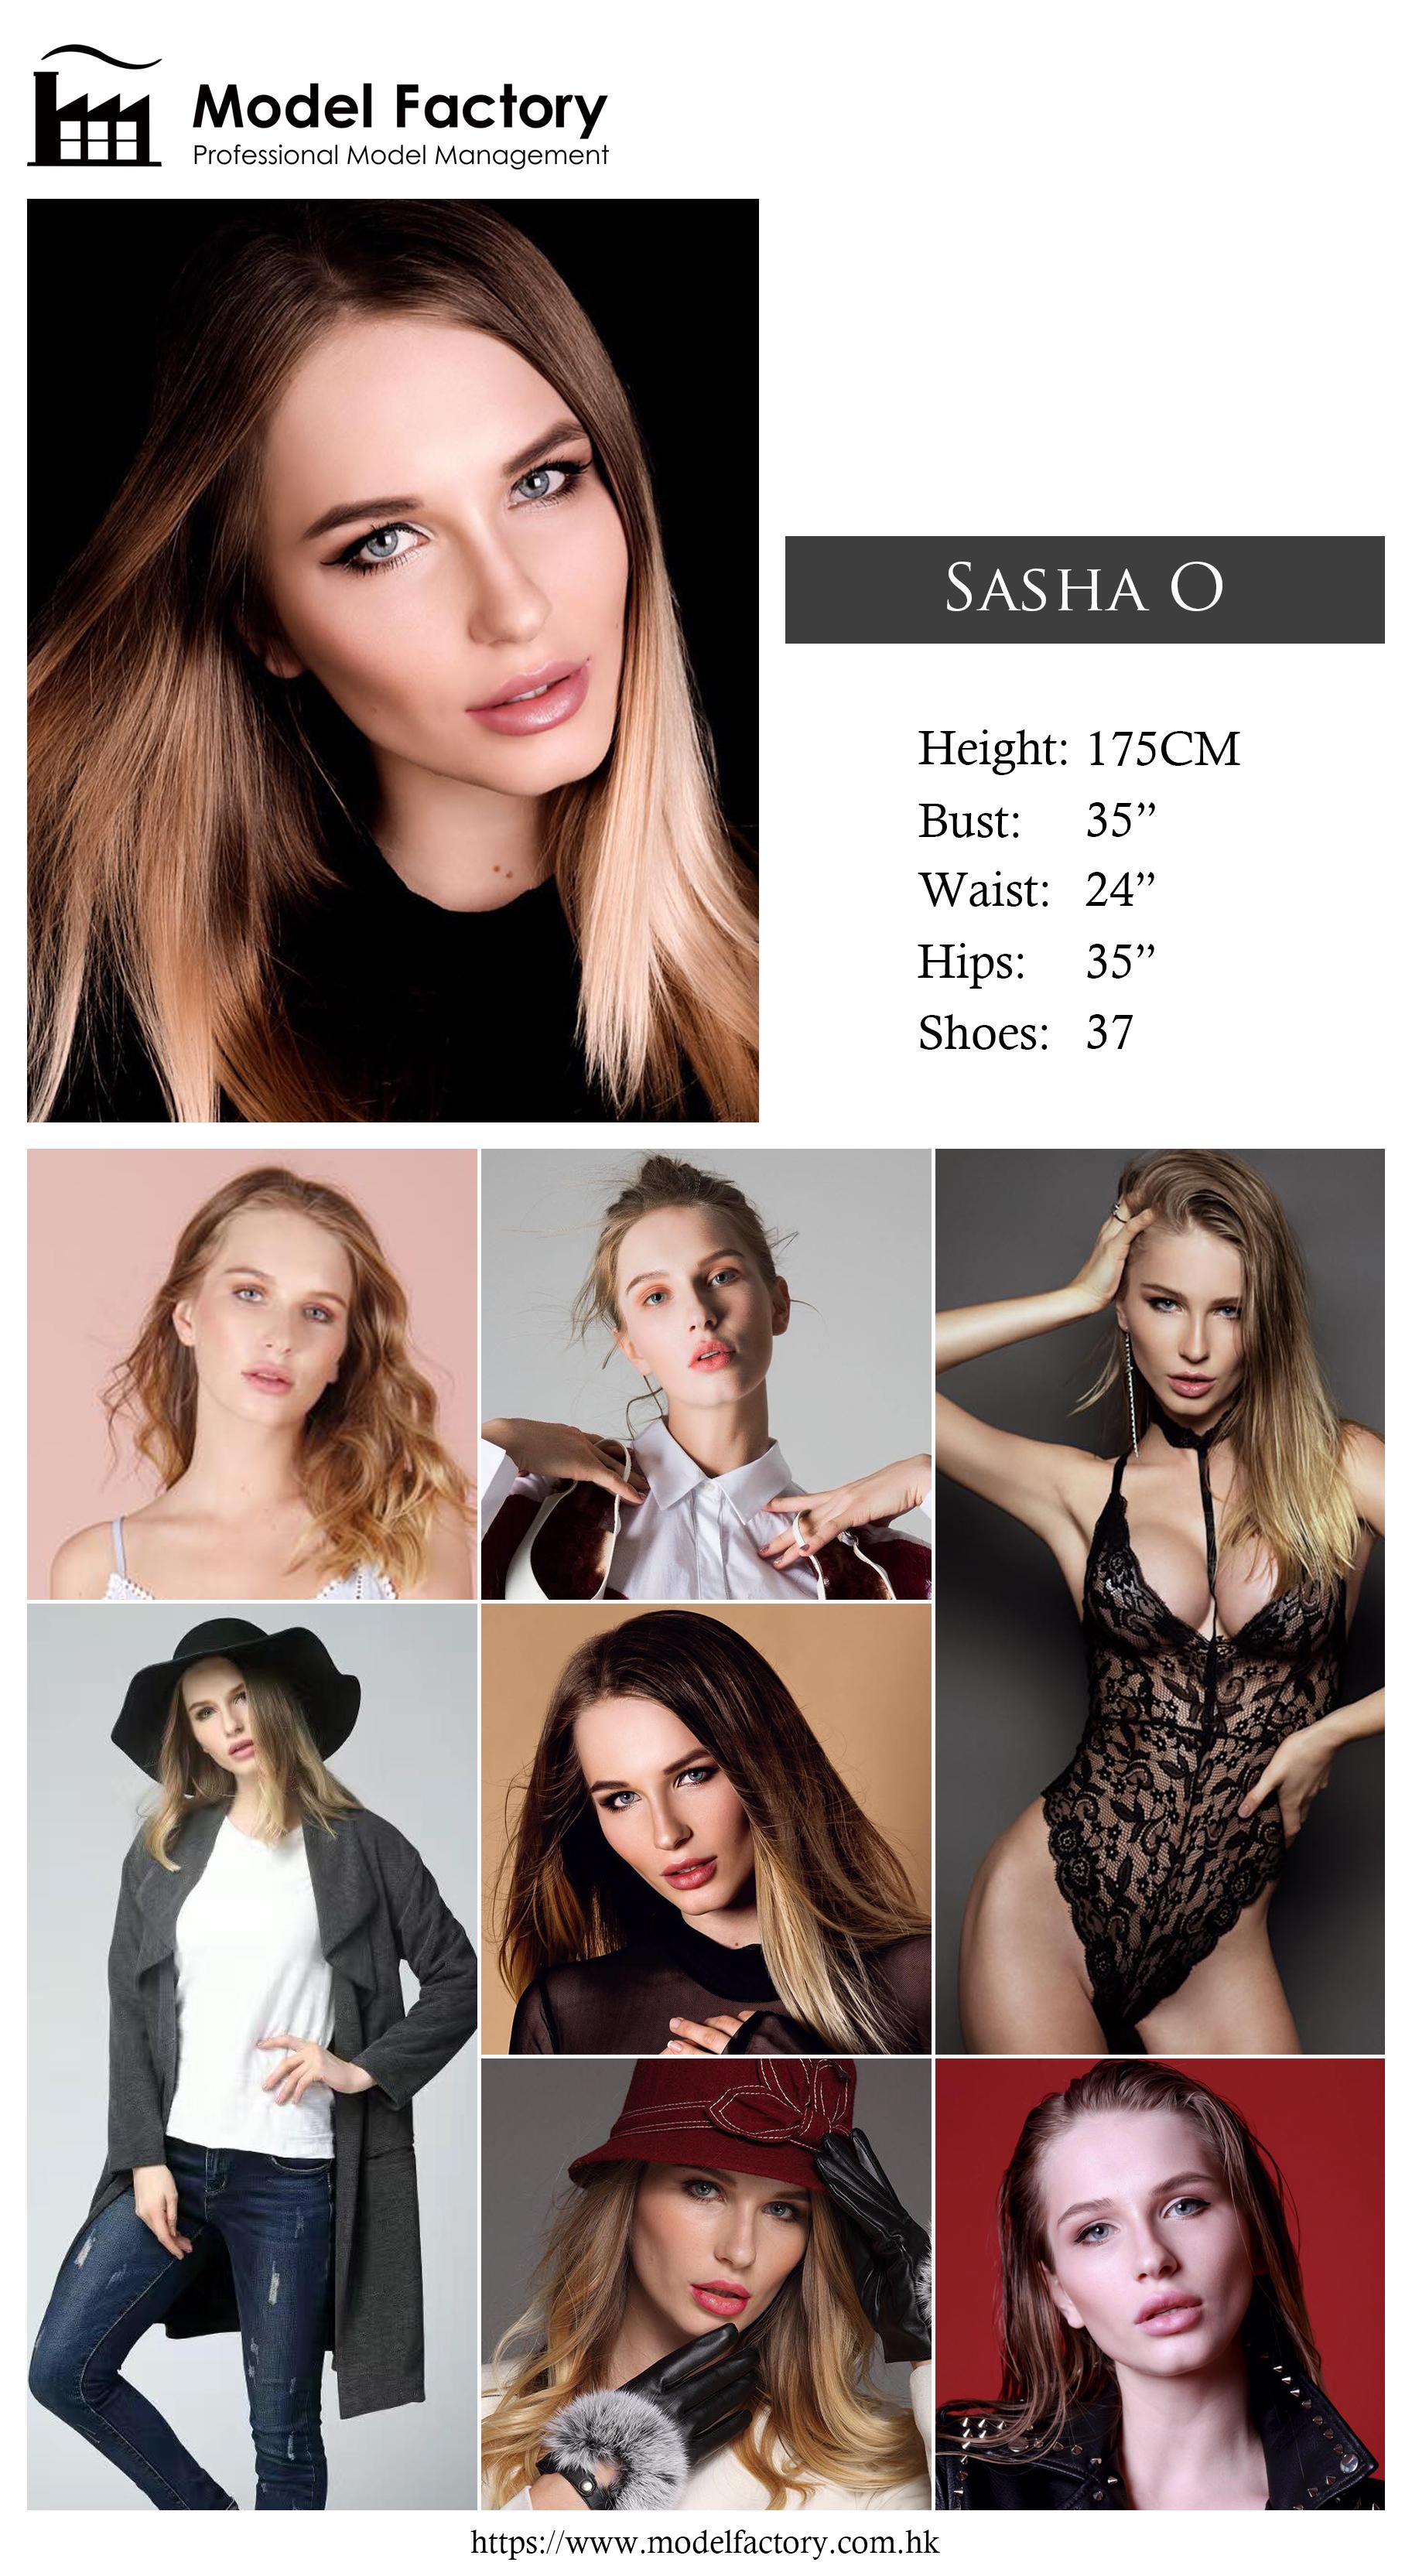 Model Factory Caucasian Female Model SashaO